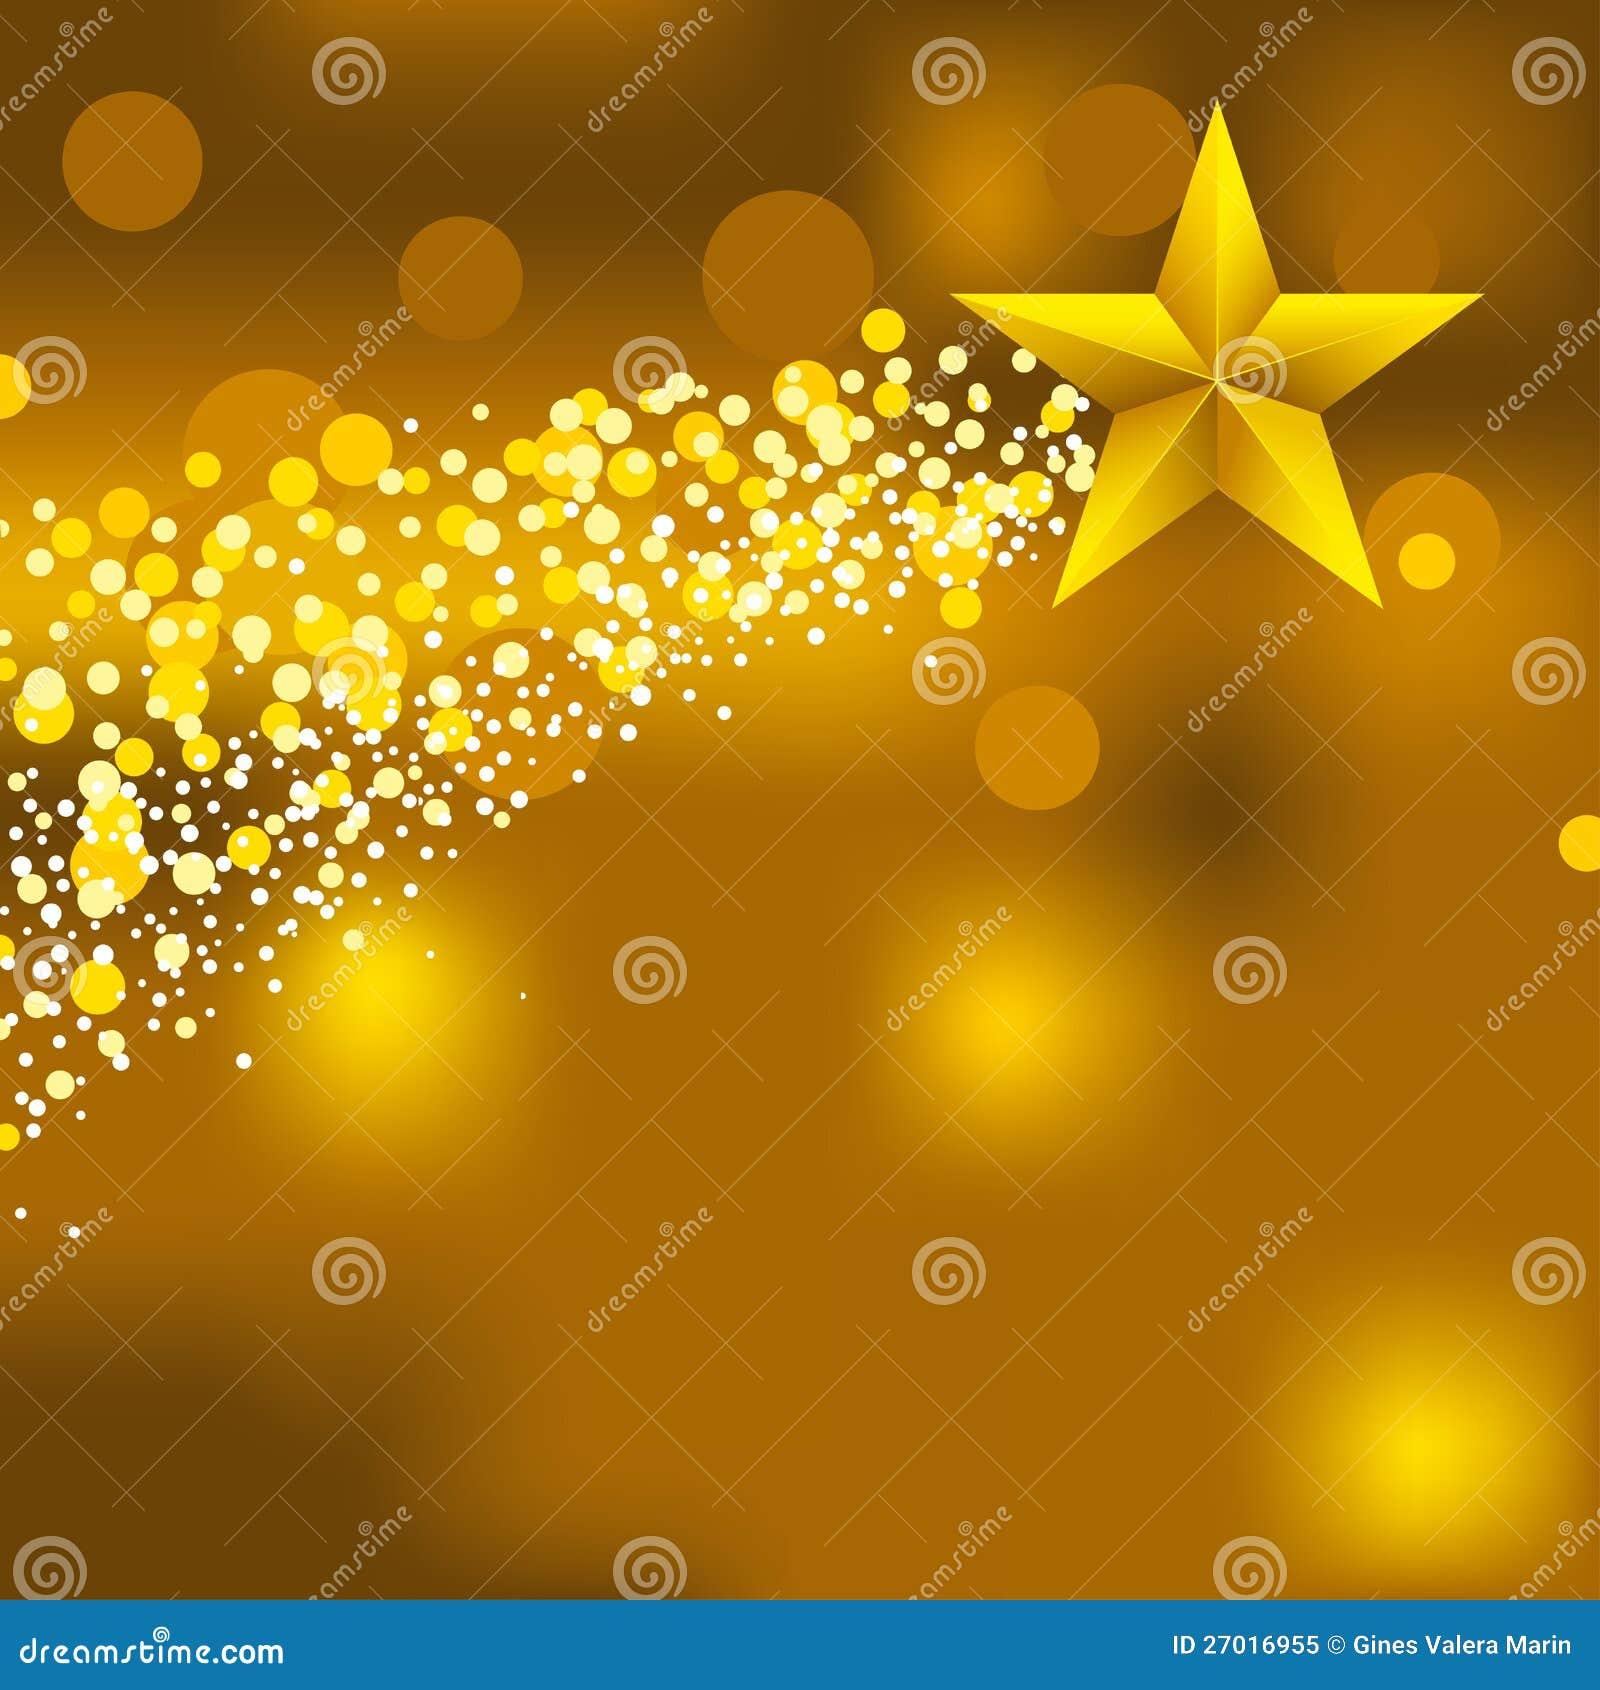 Christmas Star Background Royalty Free Stock Photo - Image: 27016955